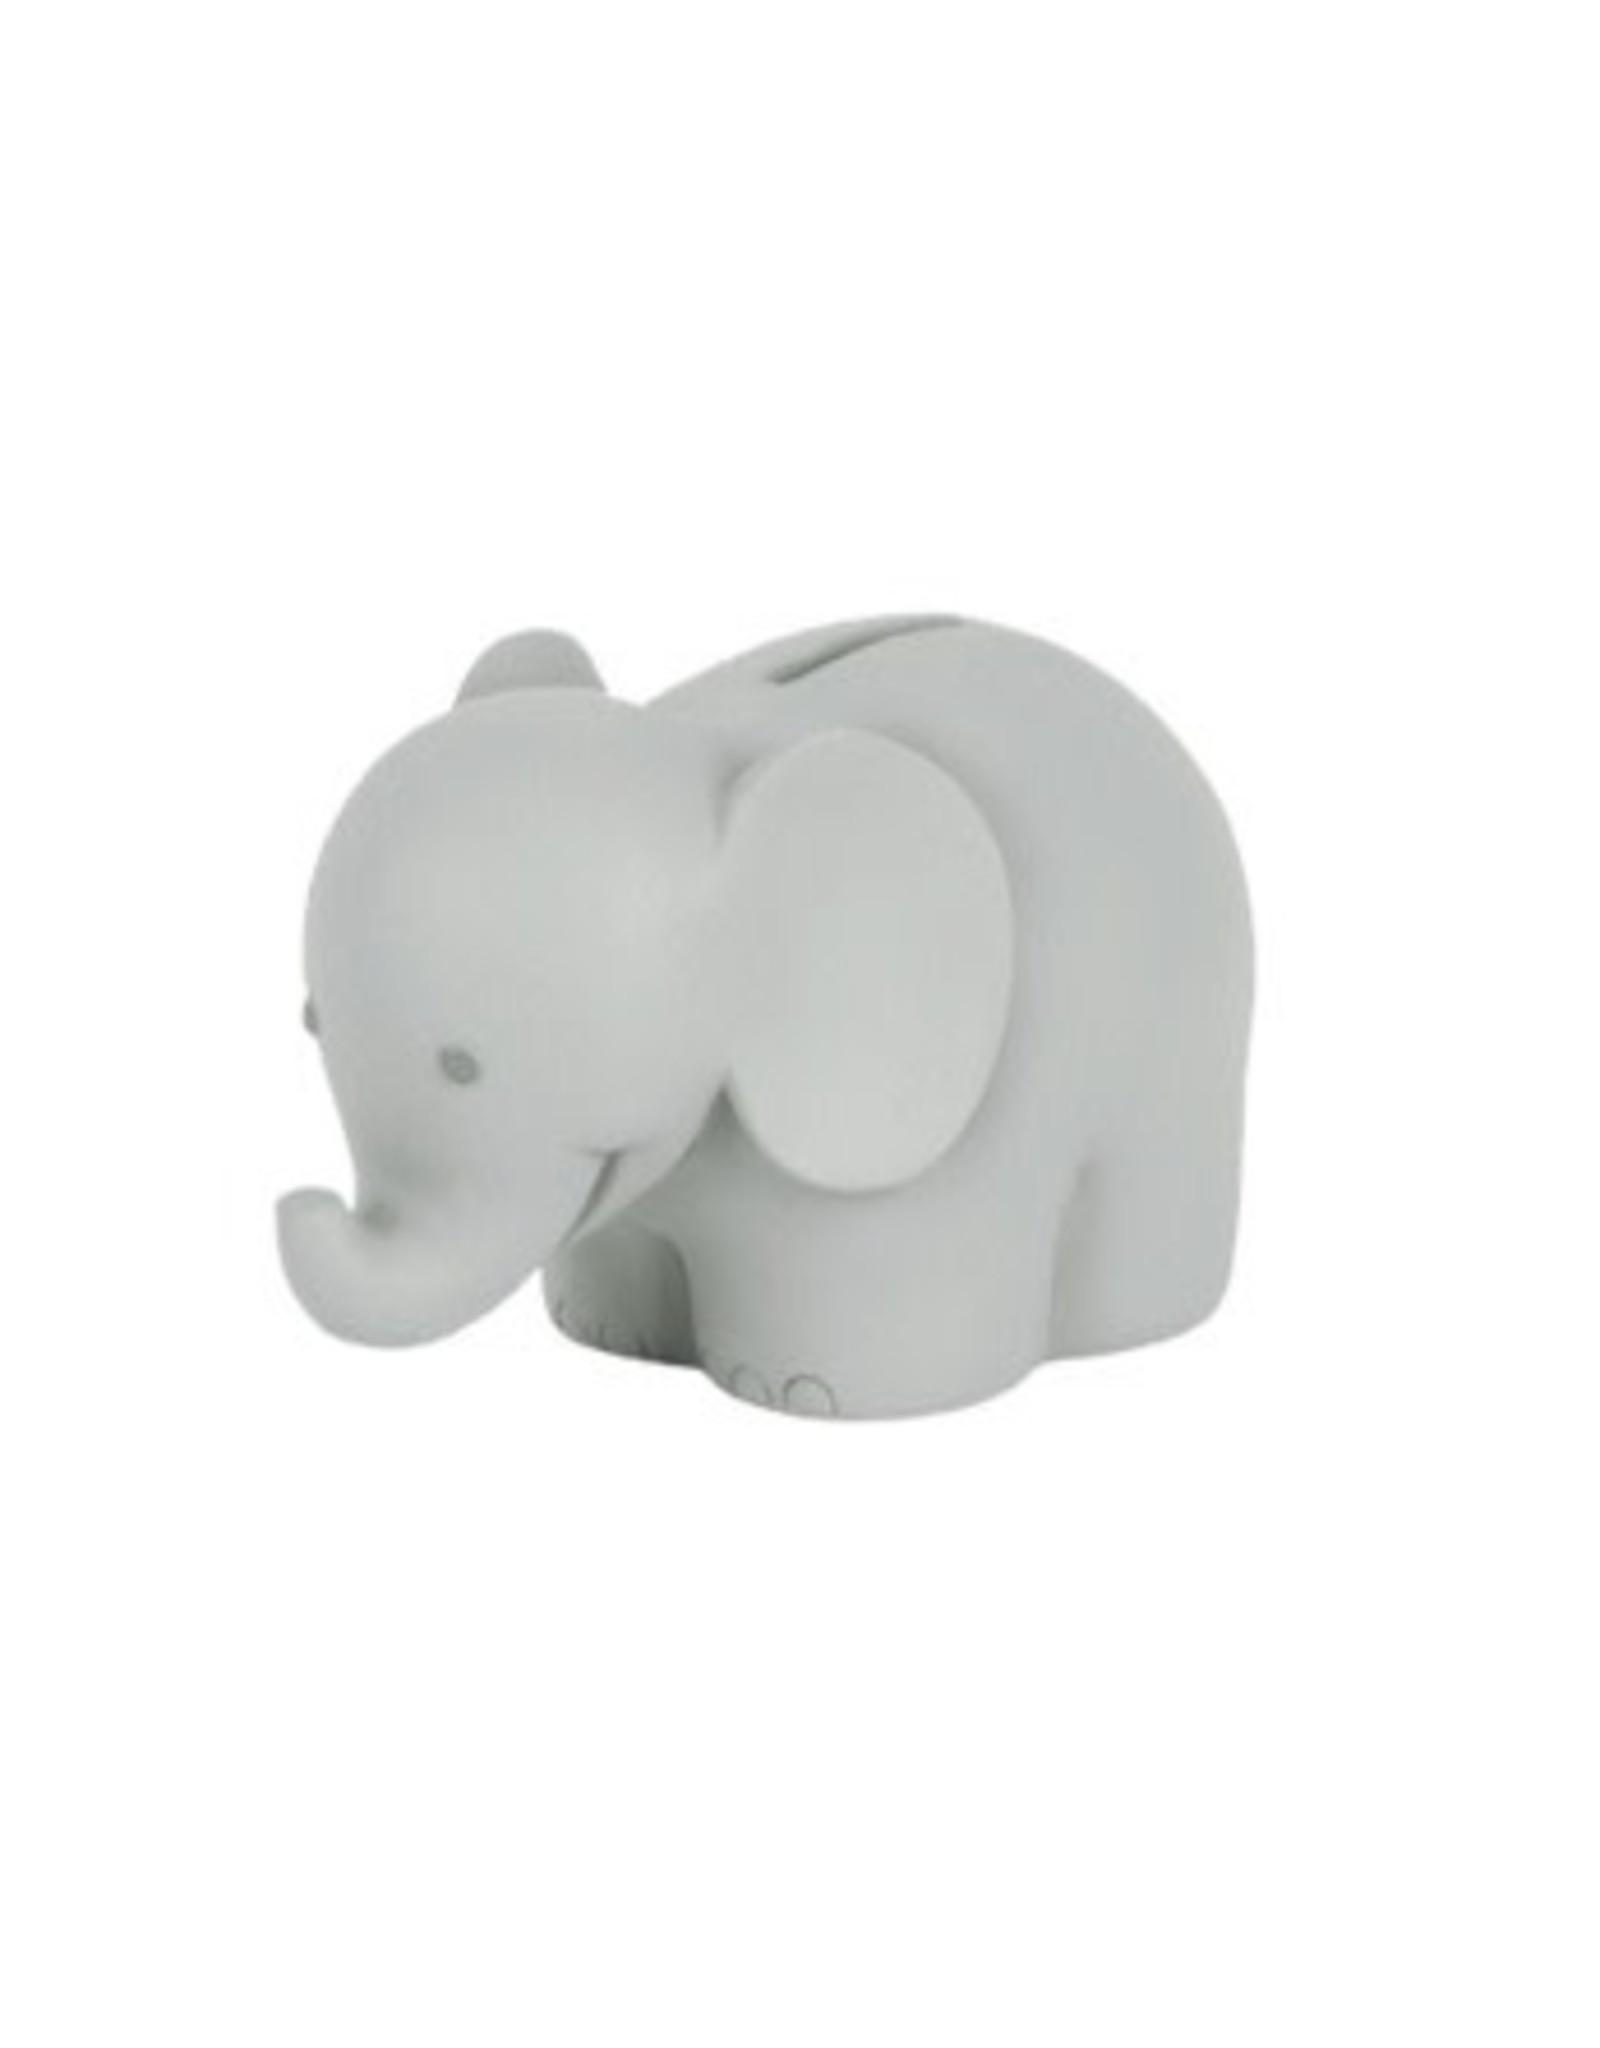 BamBam Elephant Moneybank